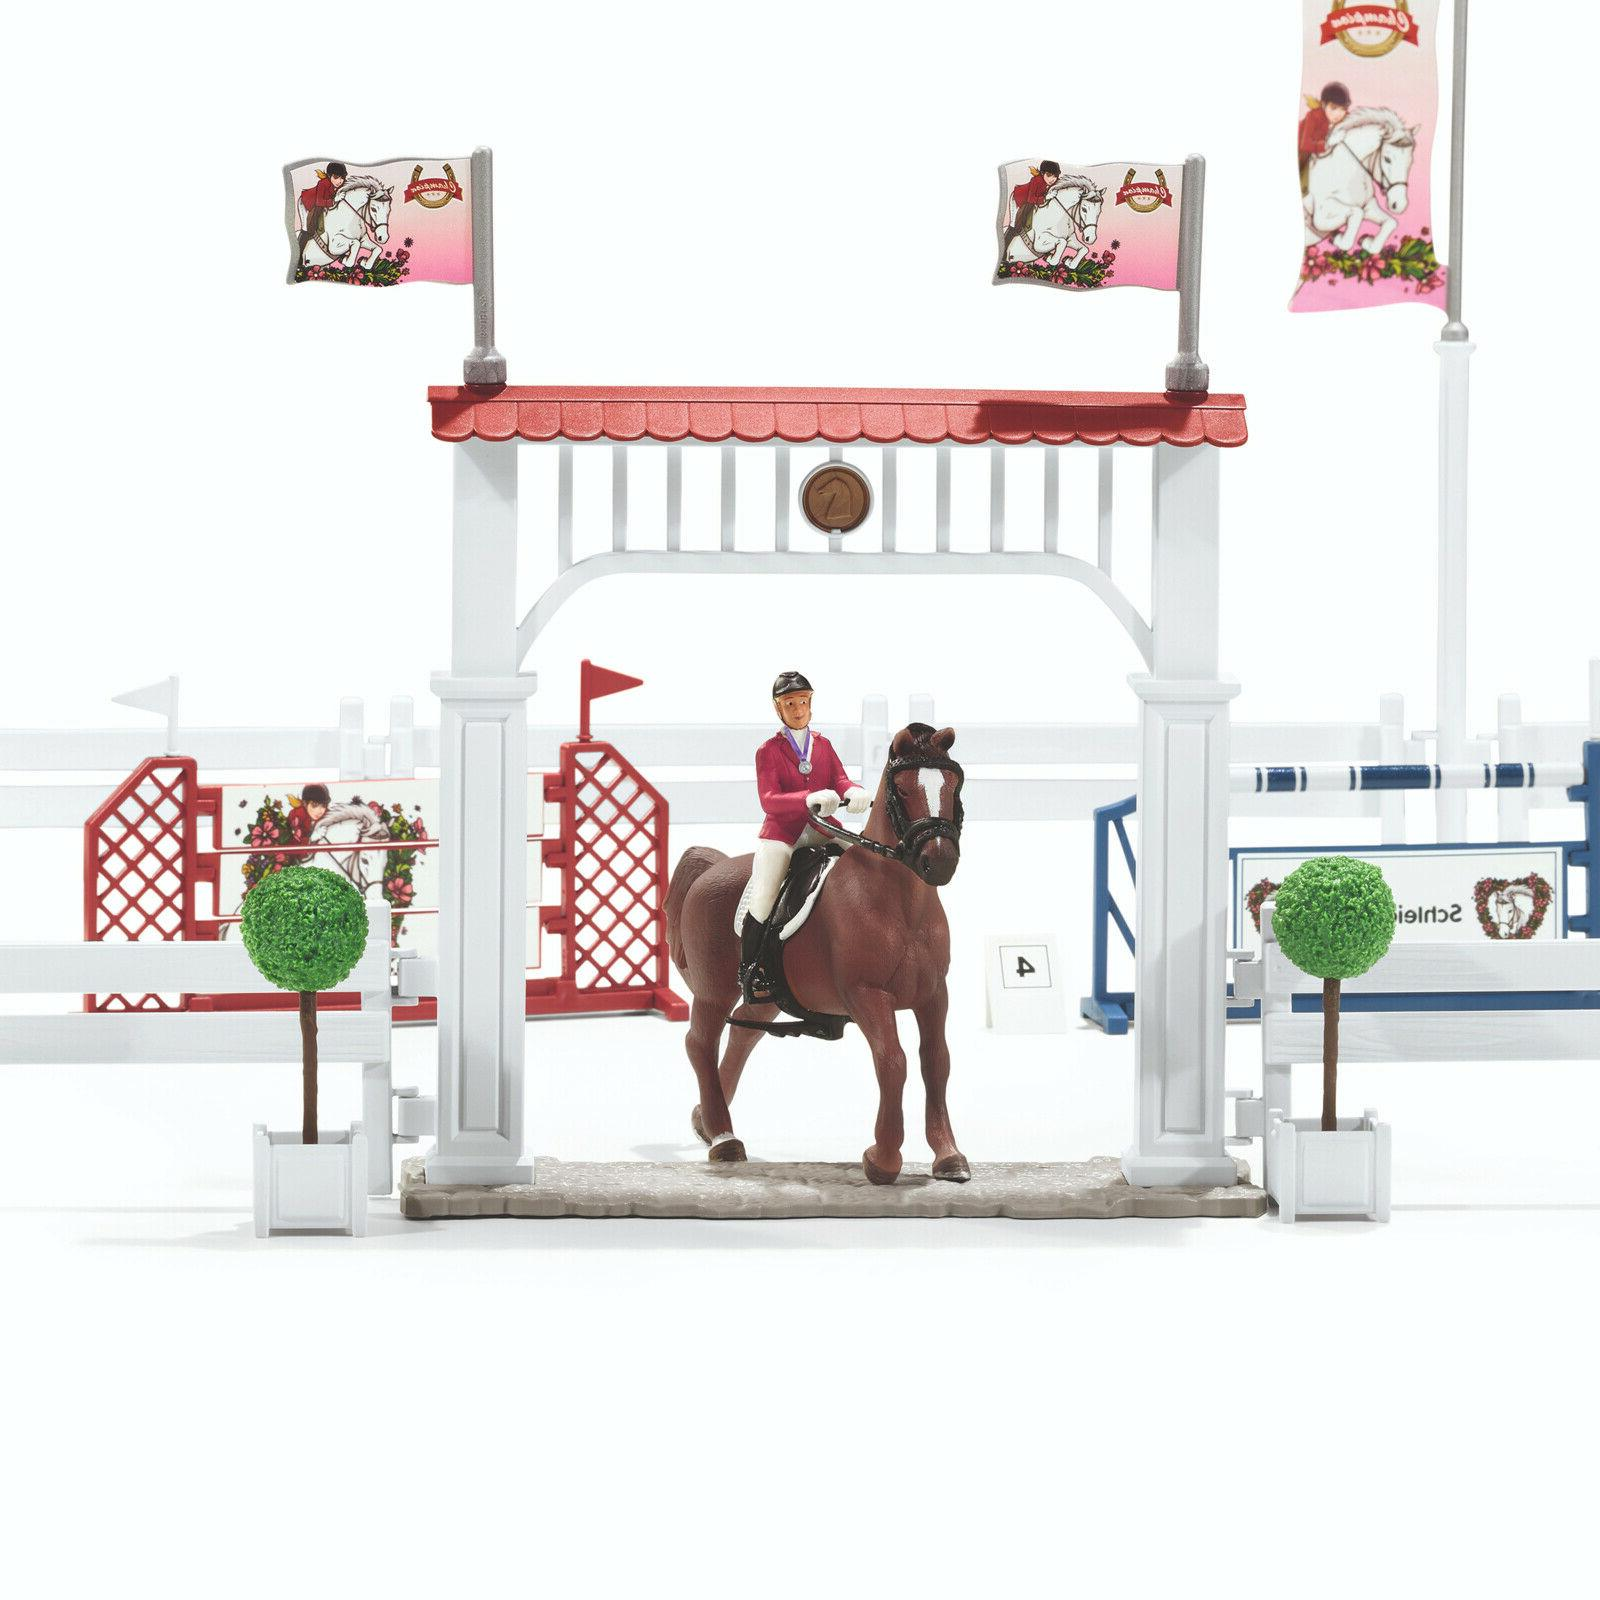 big horse show expanded tournament horse club